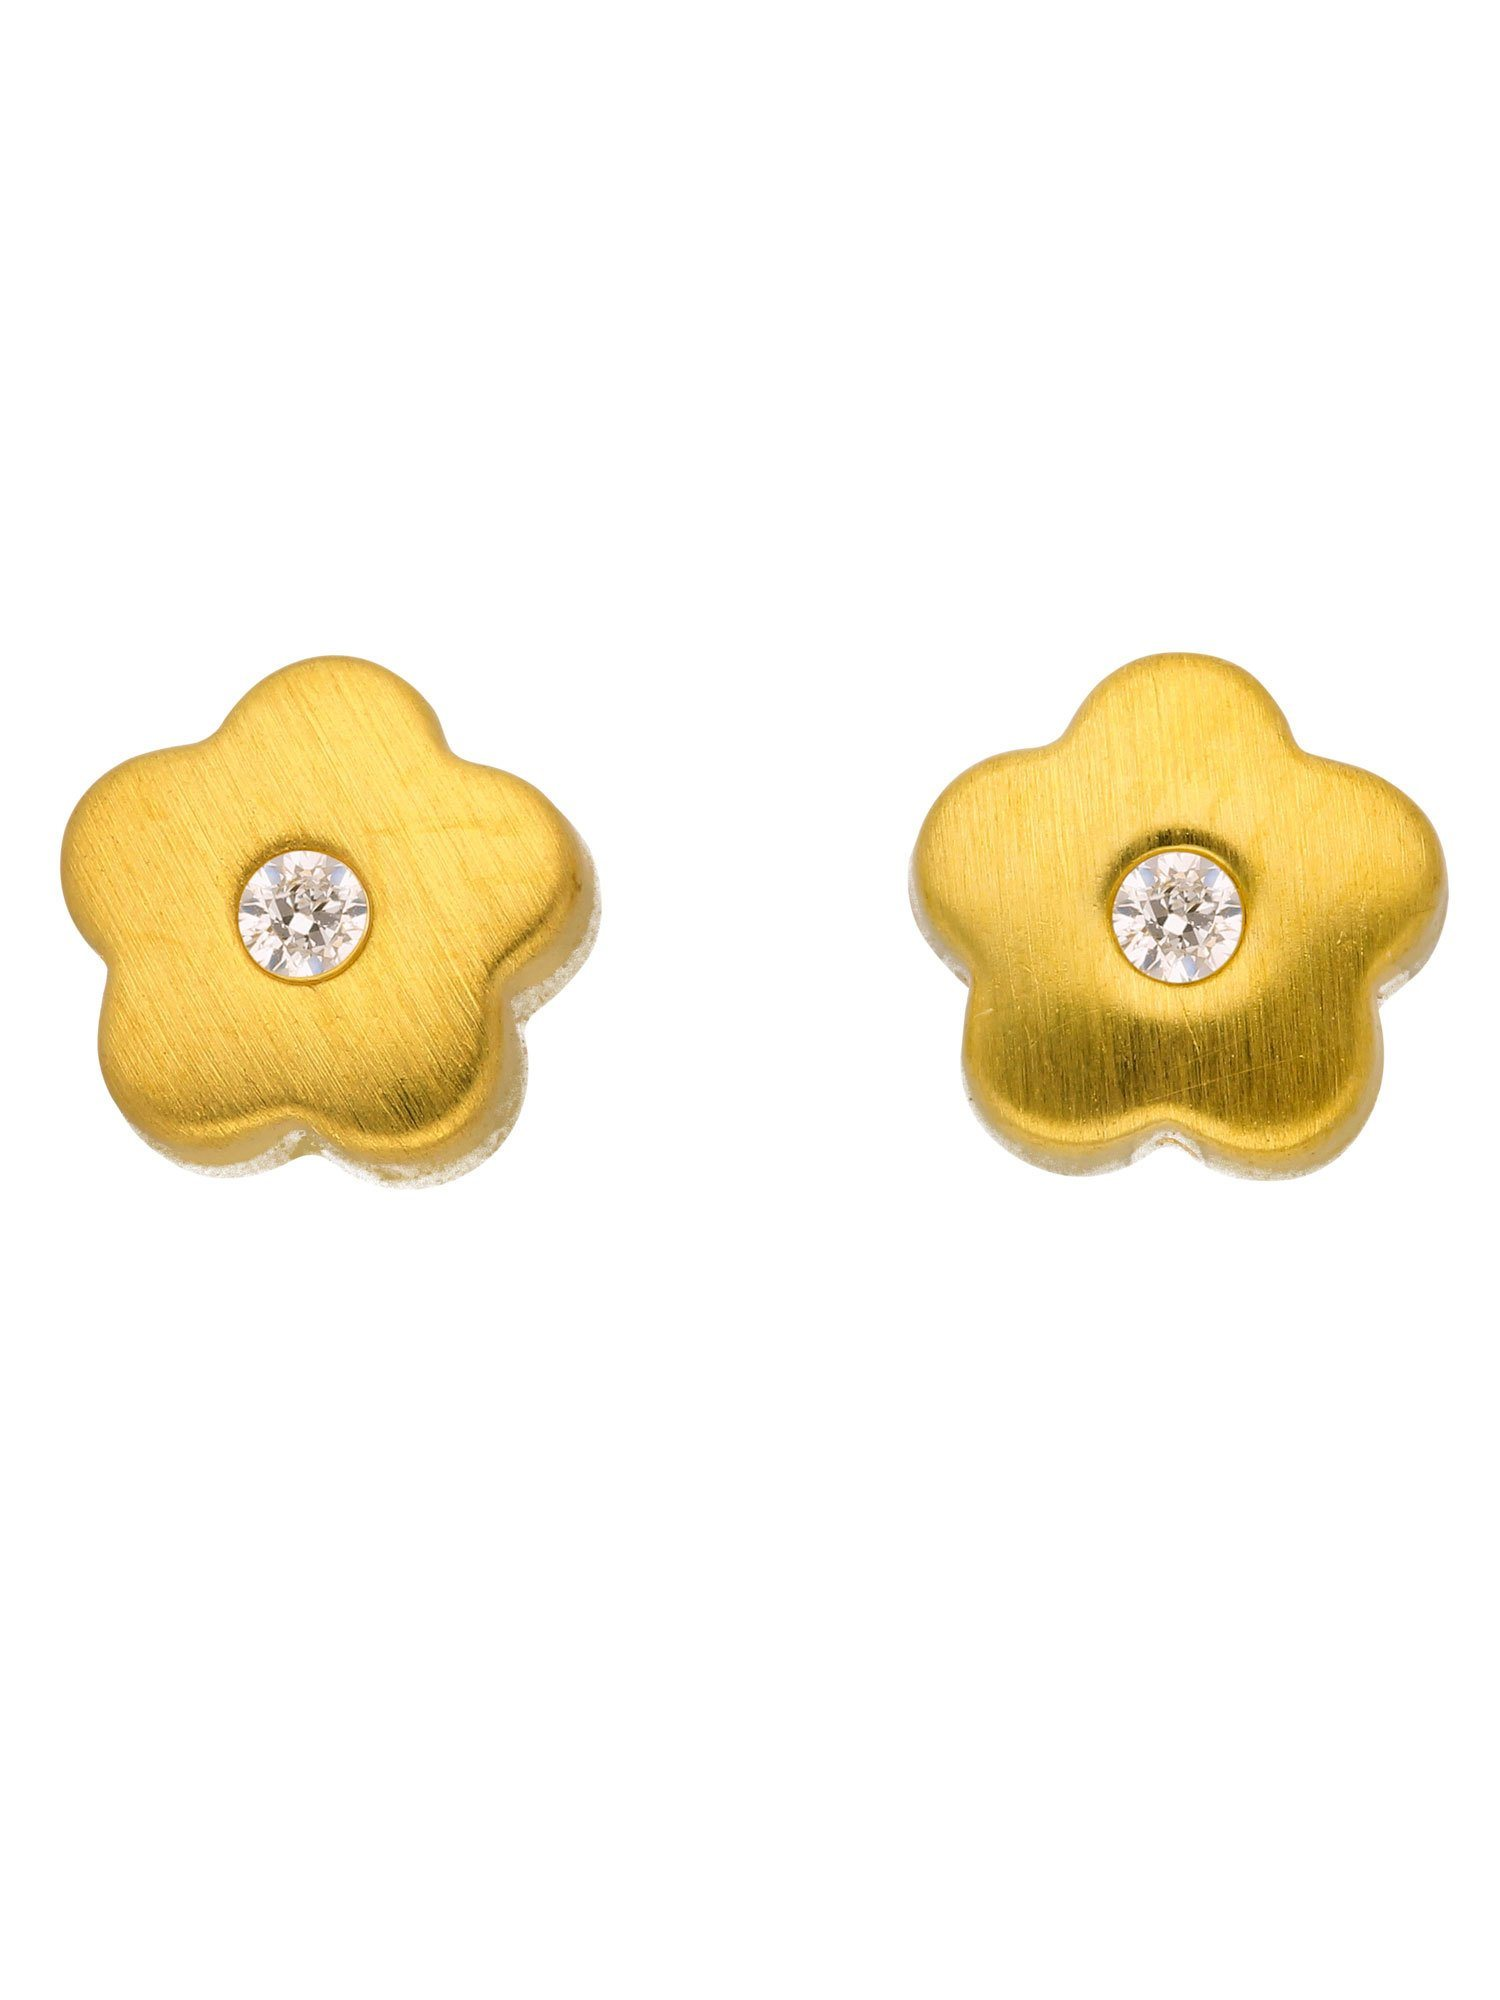 Adelia´s Paar Ohrstecker »Gold Ohrringe«, Blüte 8 k 333 Gelbgold mit Zirkonia | Schmuck > Ohrschmuck & Ohrringe > Ohrstecker | Adelia´s